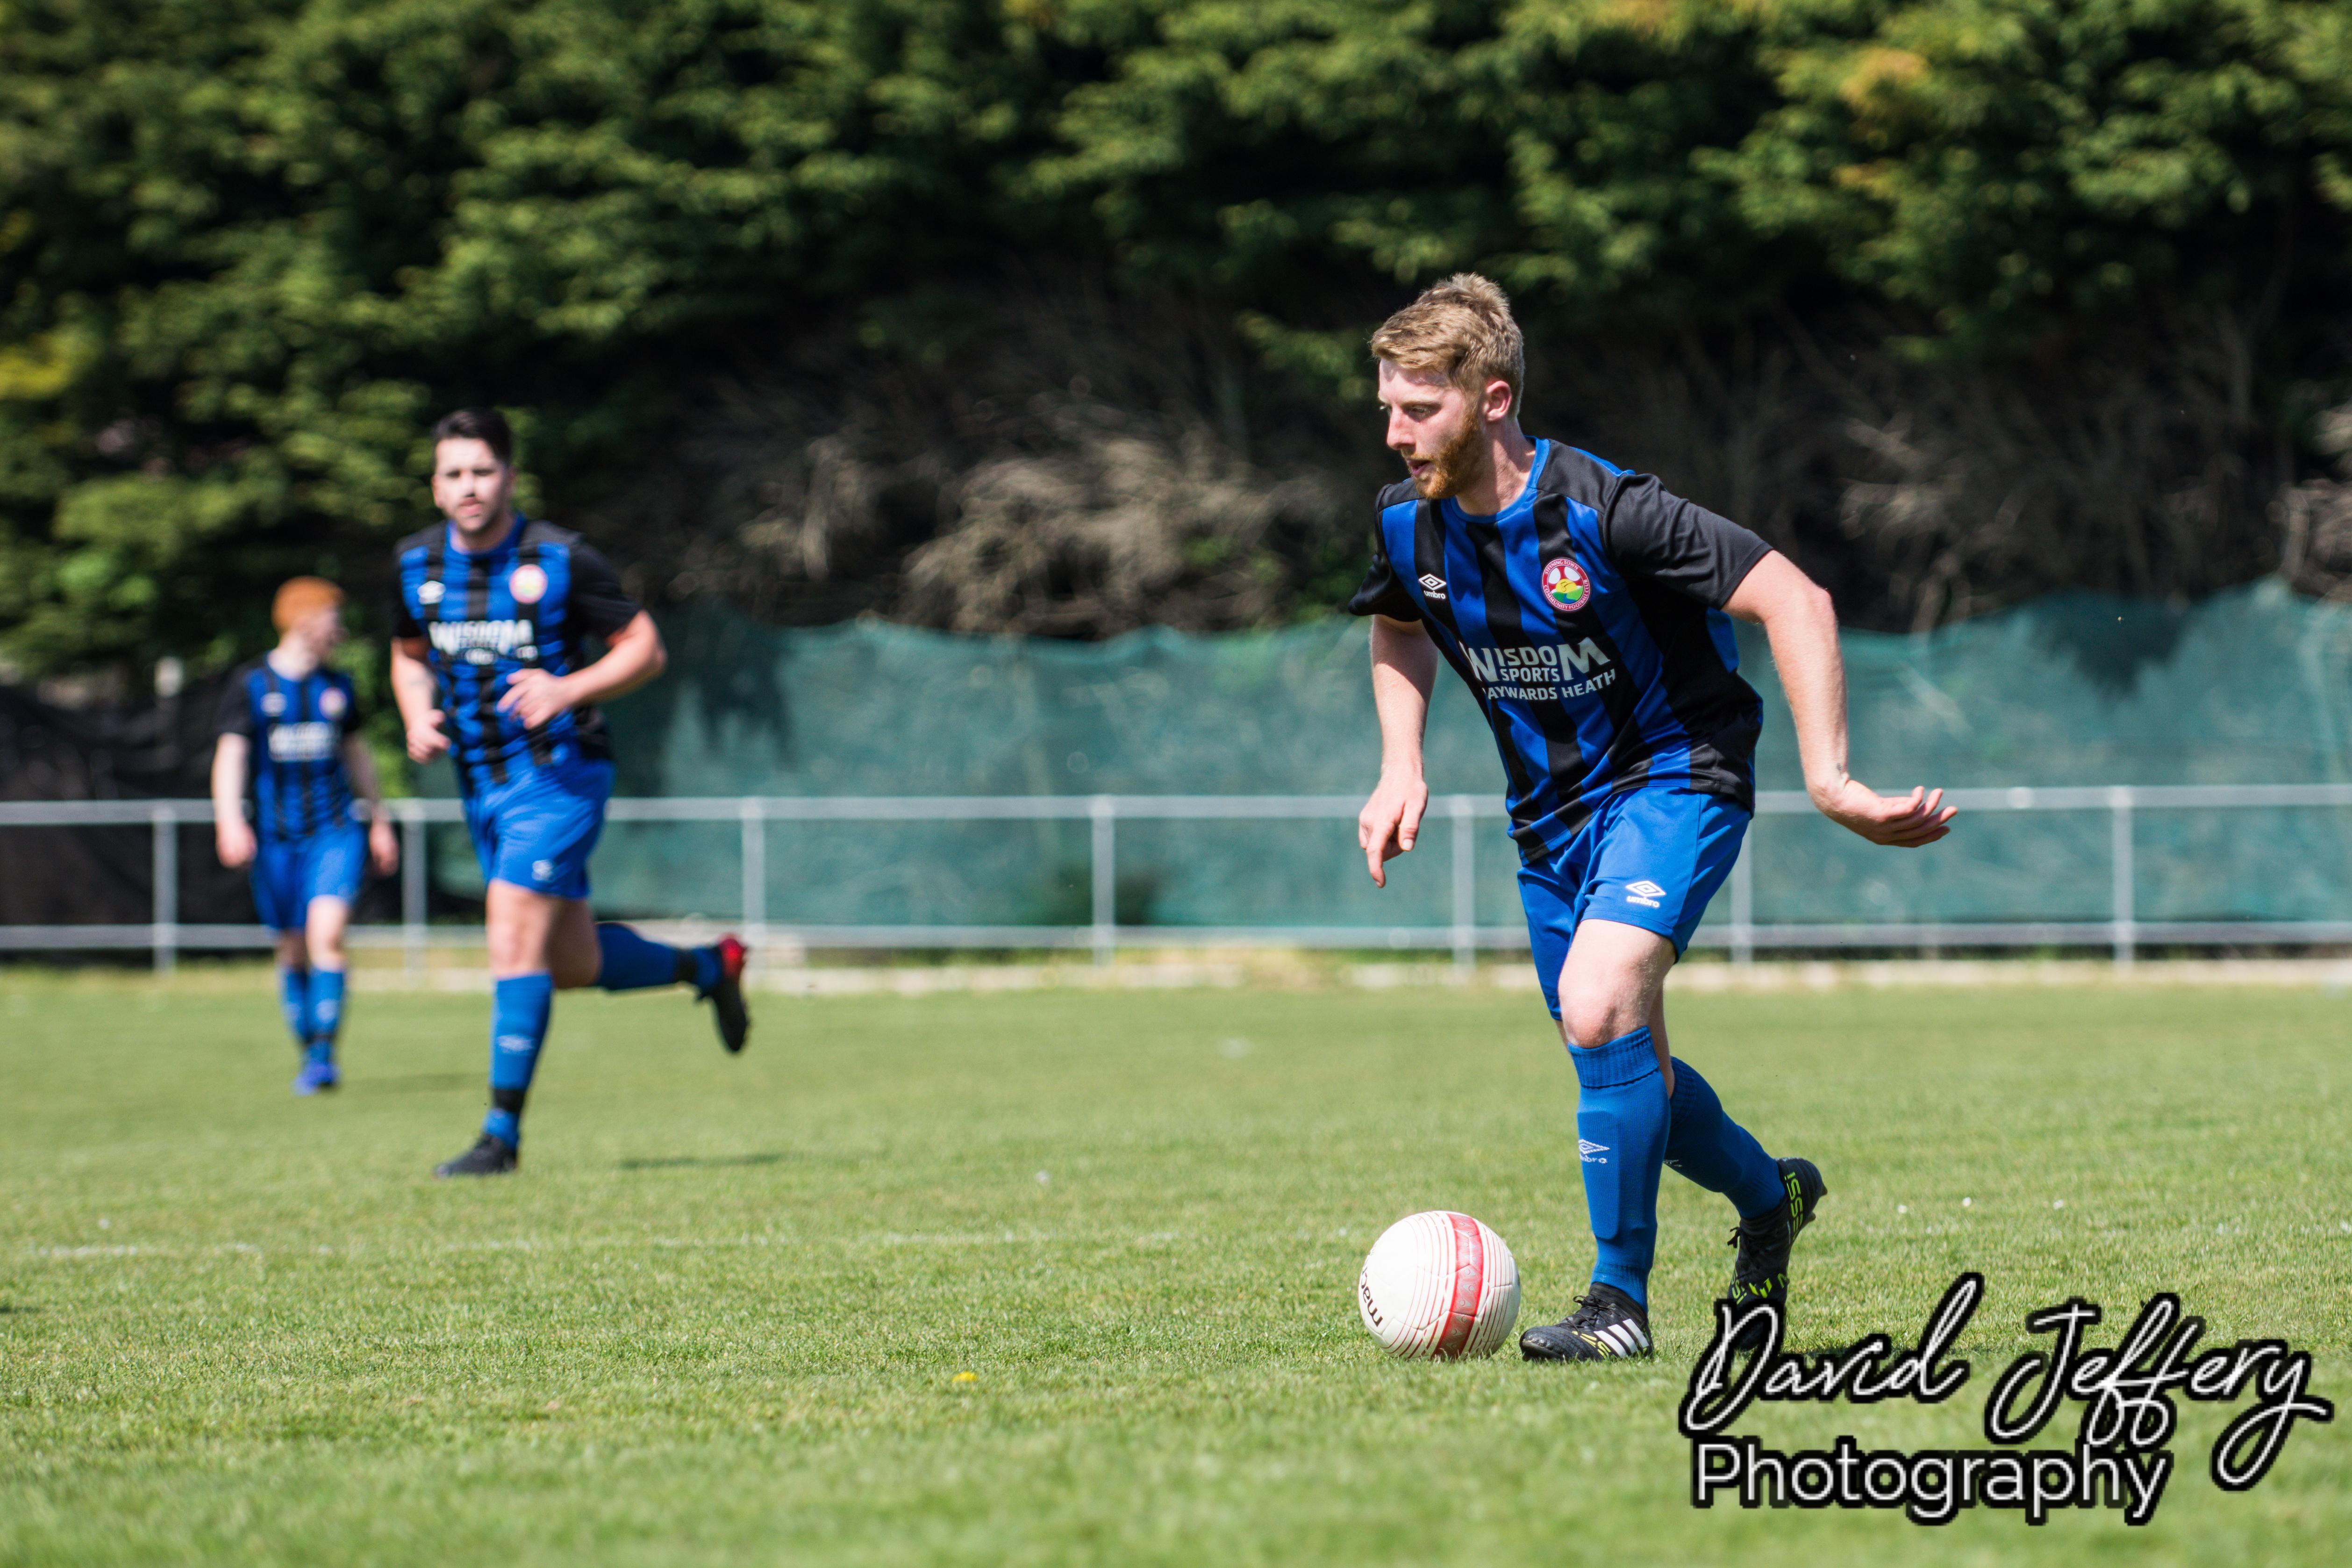 081 Steyn vs Wick, Div1 Cup Final DAVID_